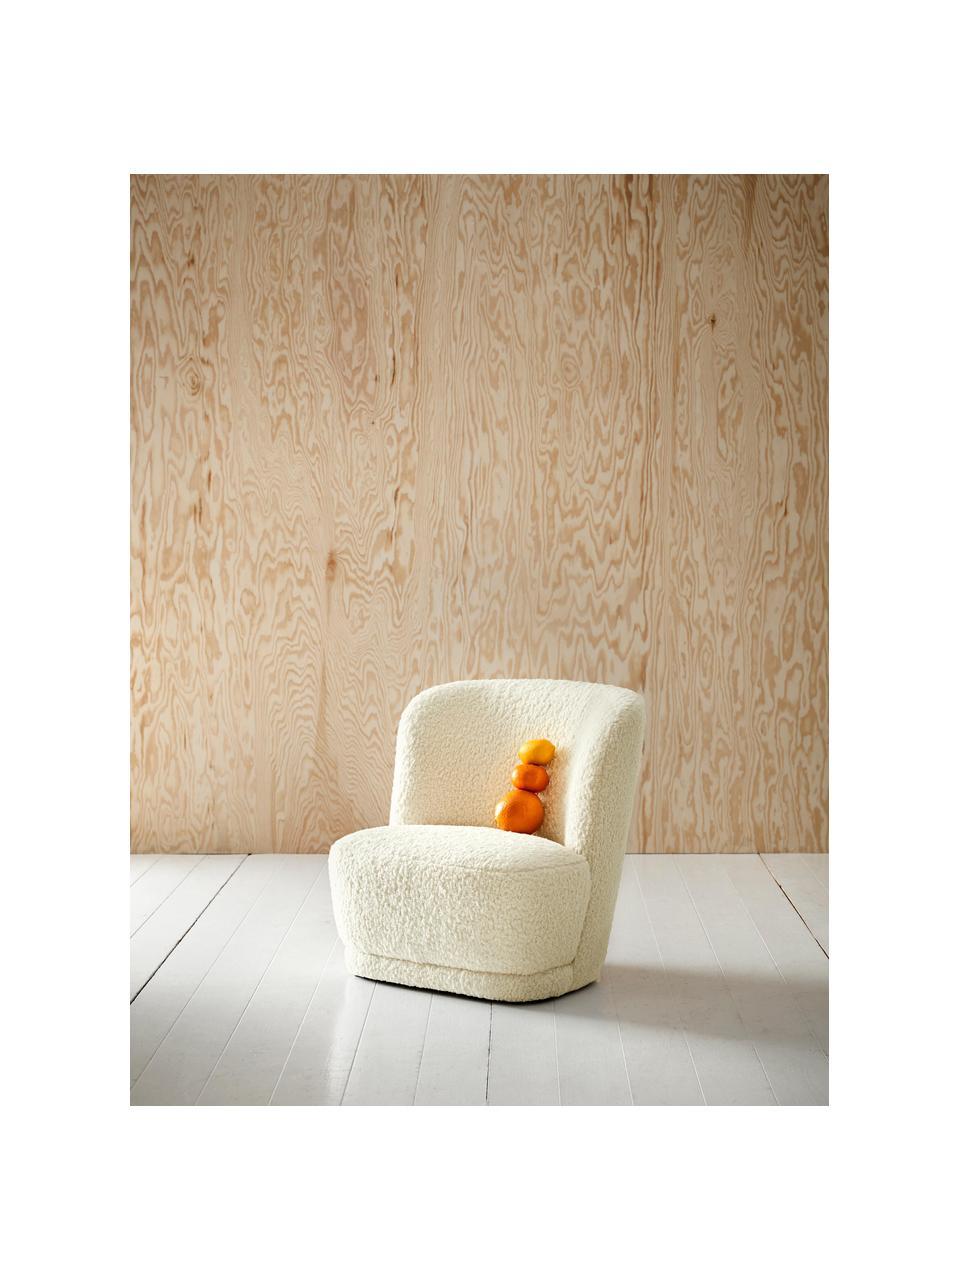 Kindersessel Marella, Bezug: Polyester, Gestell: Kiefernholz, Cremeweiß, B 54 x T 56 cm